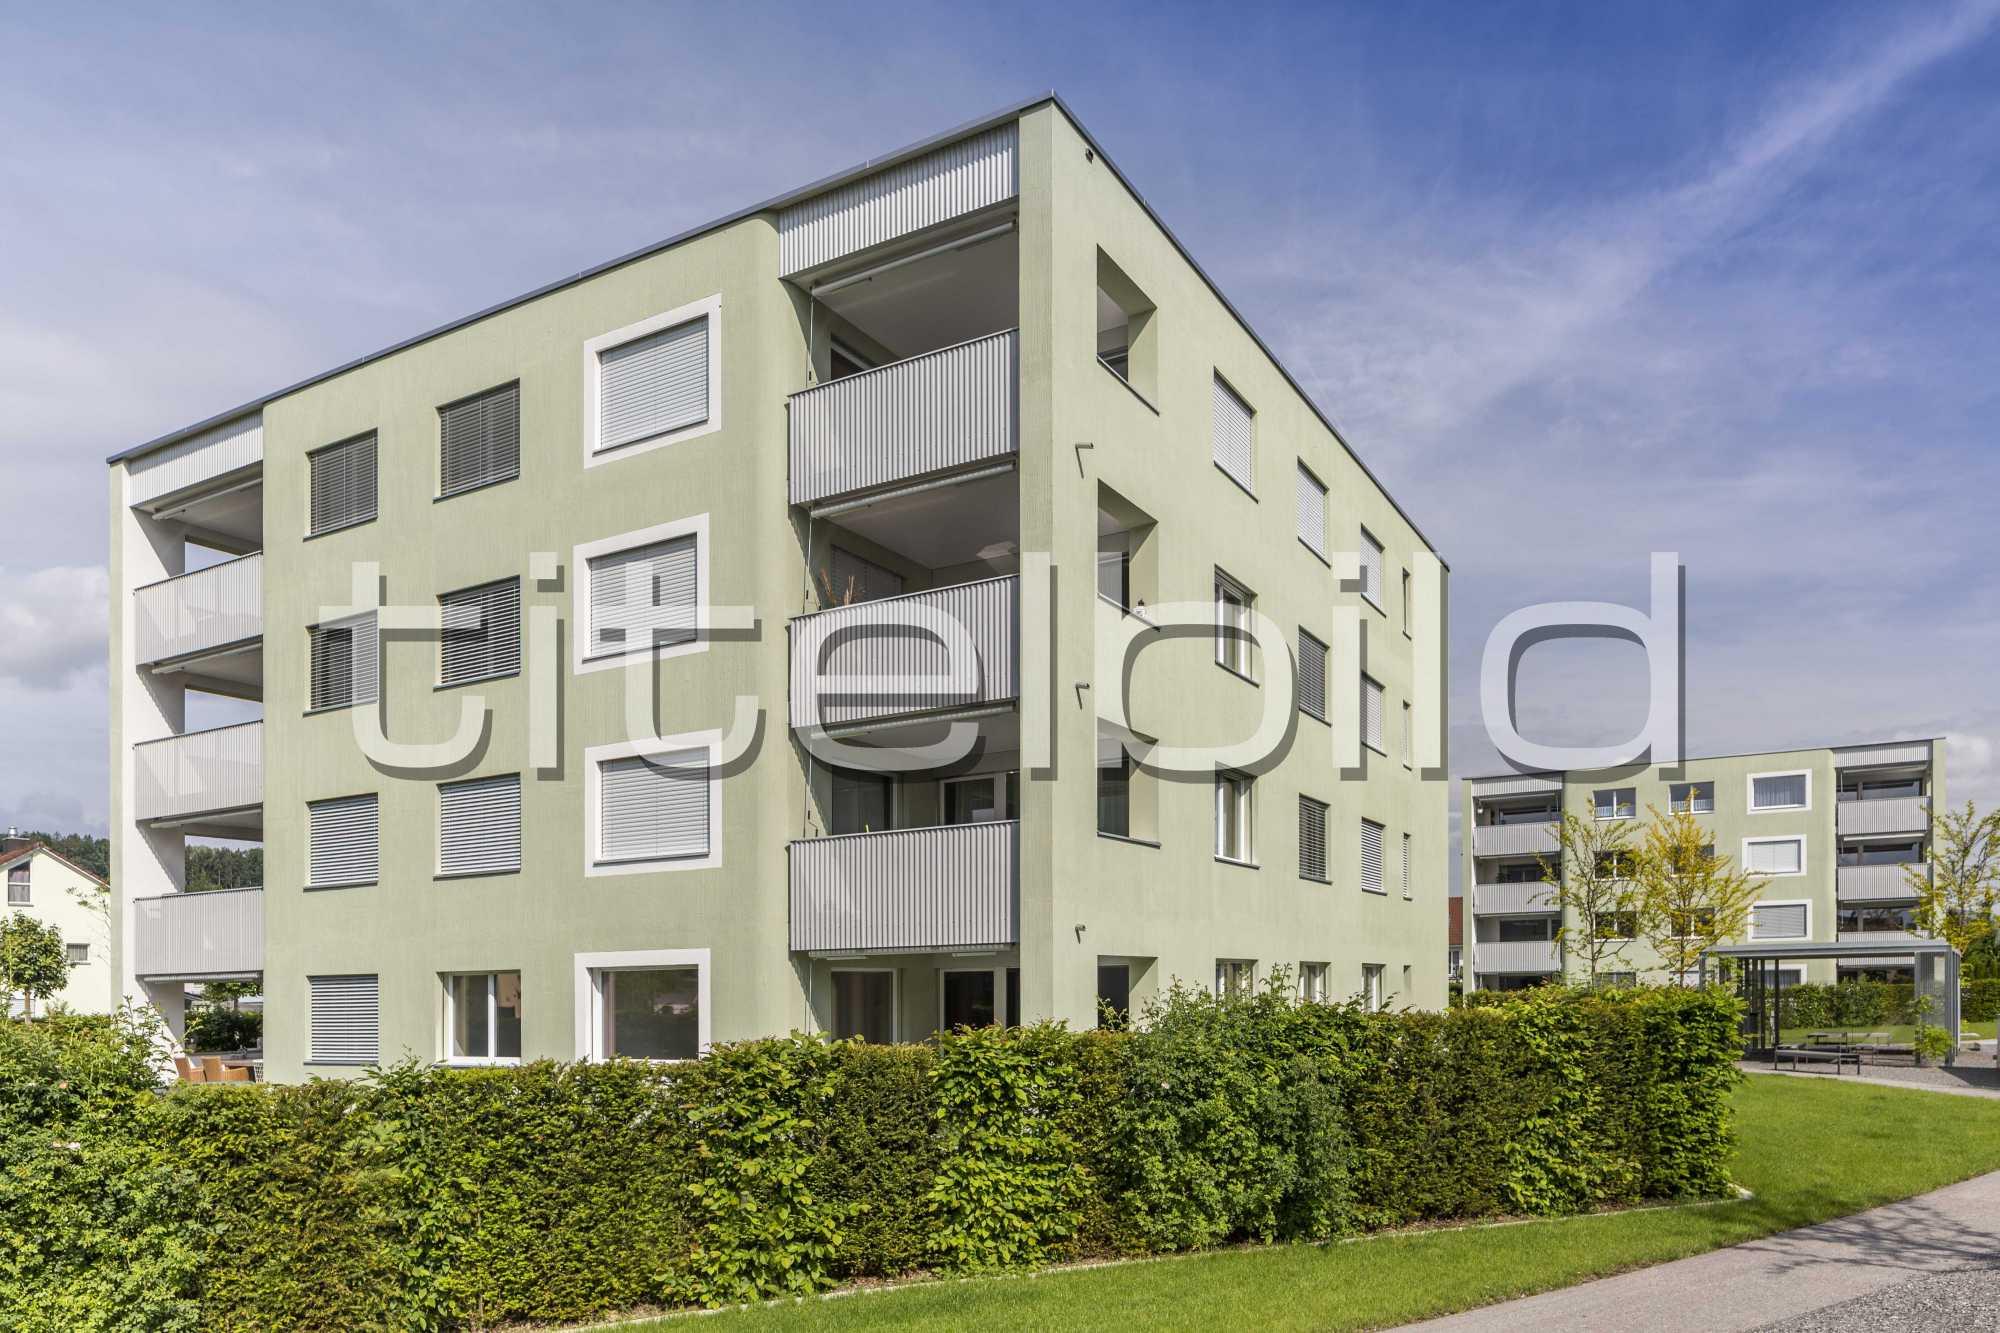 Projektbild-Nr. 6: Parksiedlung Wiggerweg